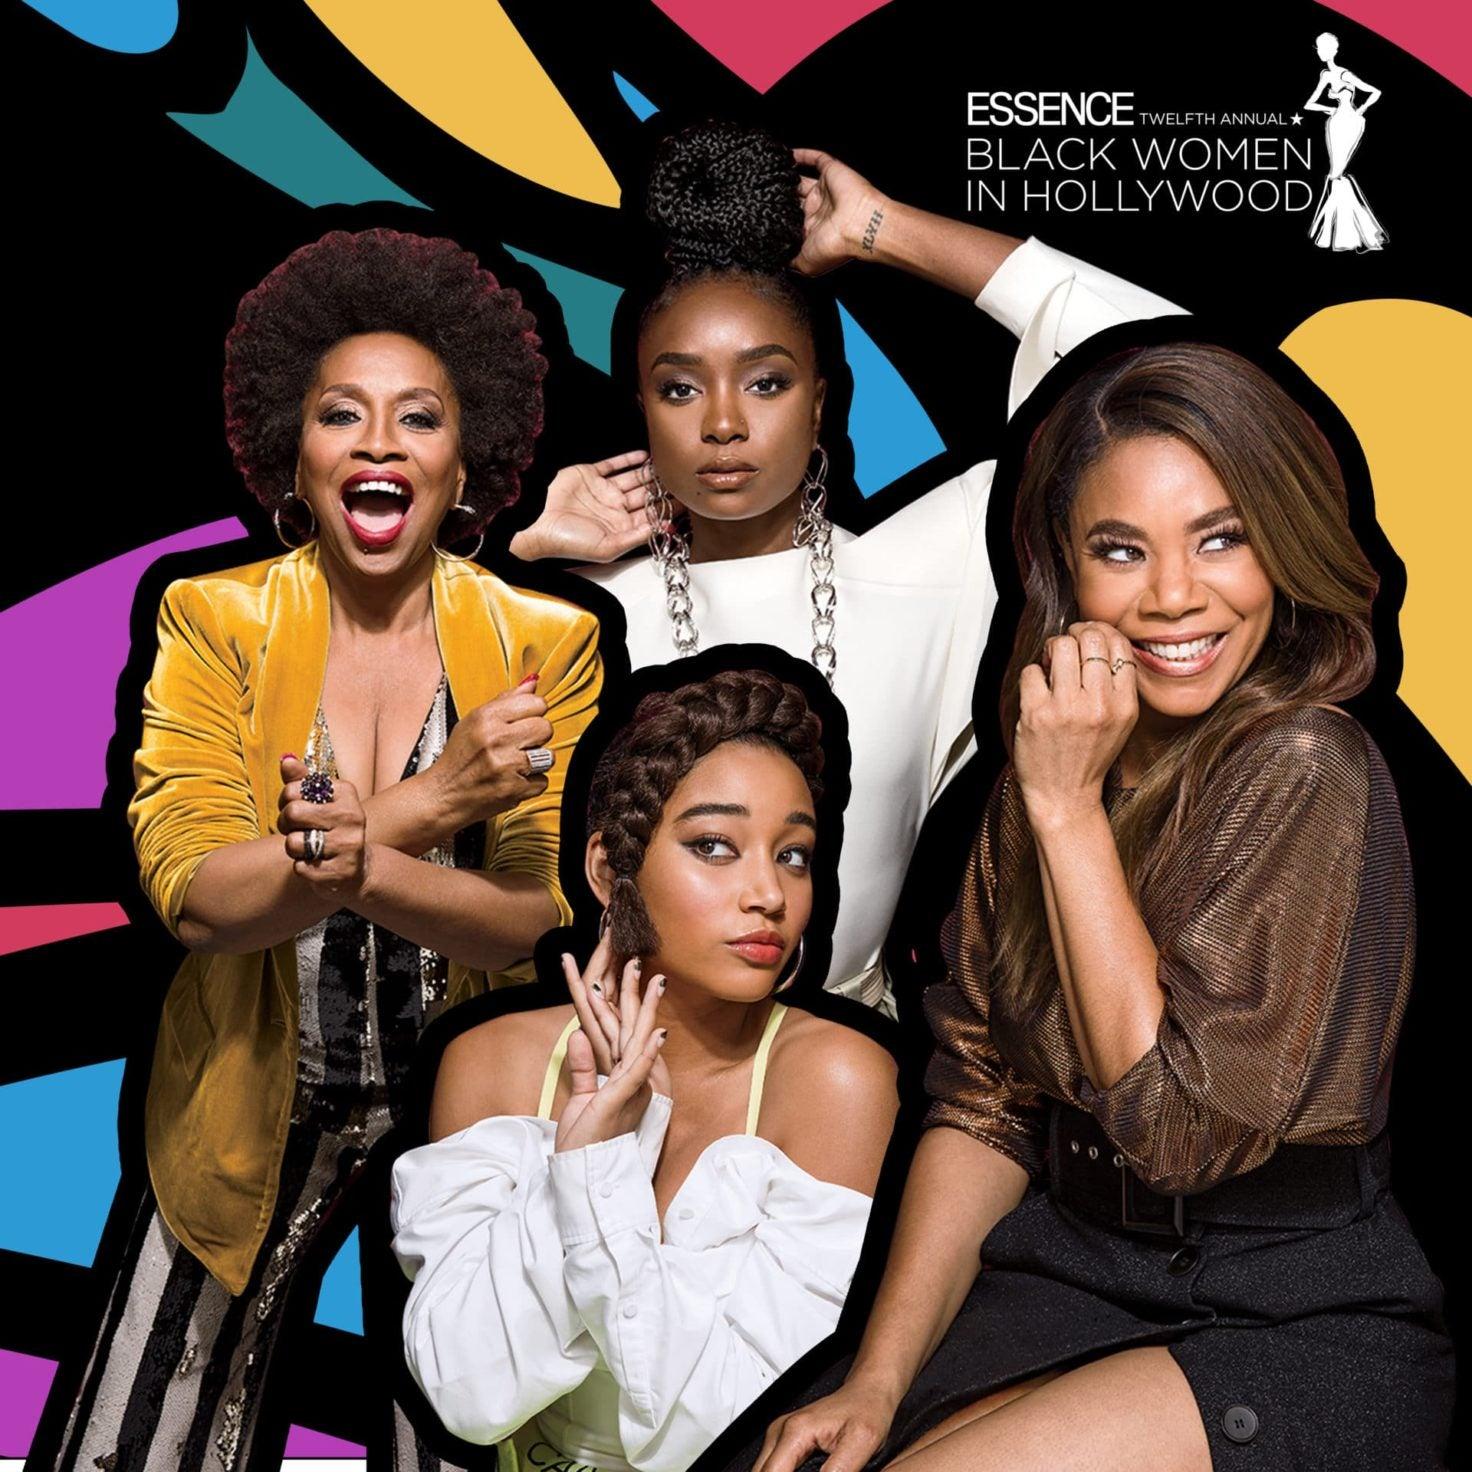 ESSENCE Black Women In Hollywood Awards To Honor Amandla Stenberg, Jenifer Lewis, Kiki Layne & Regina Hall